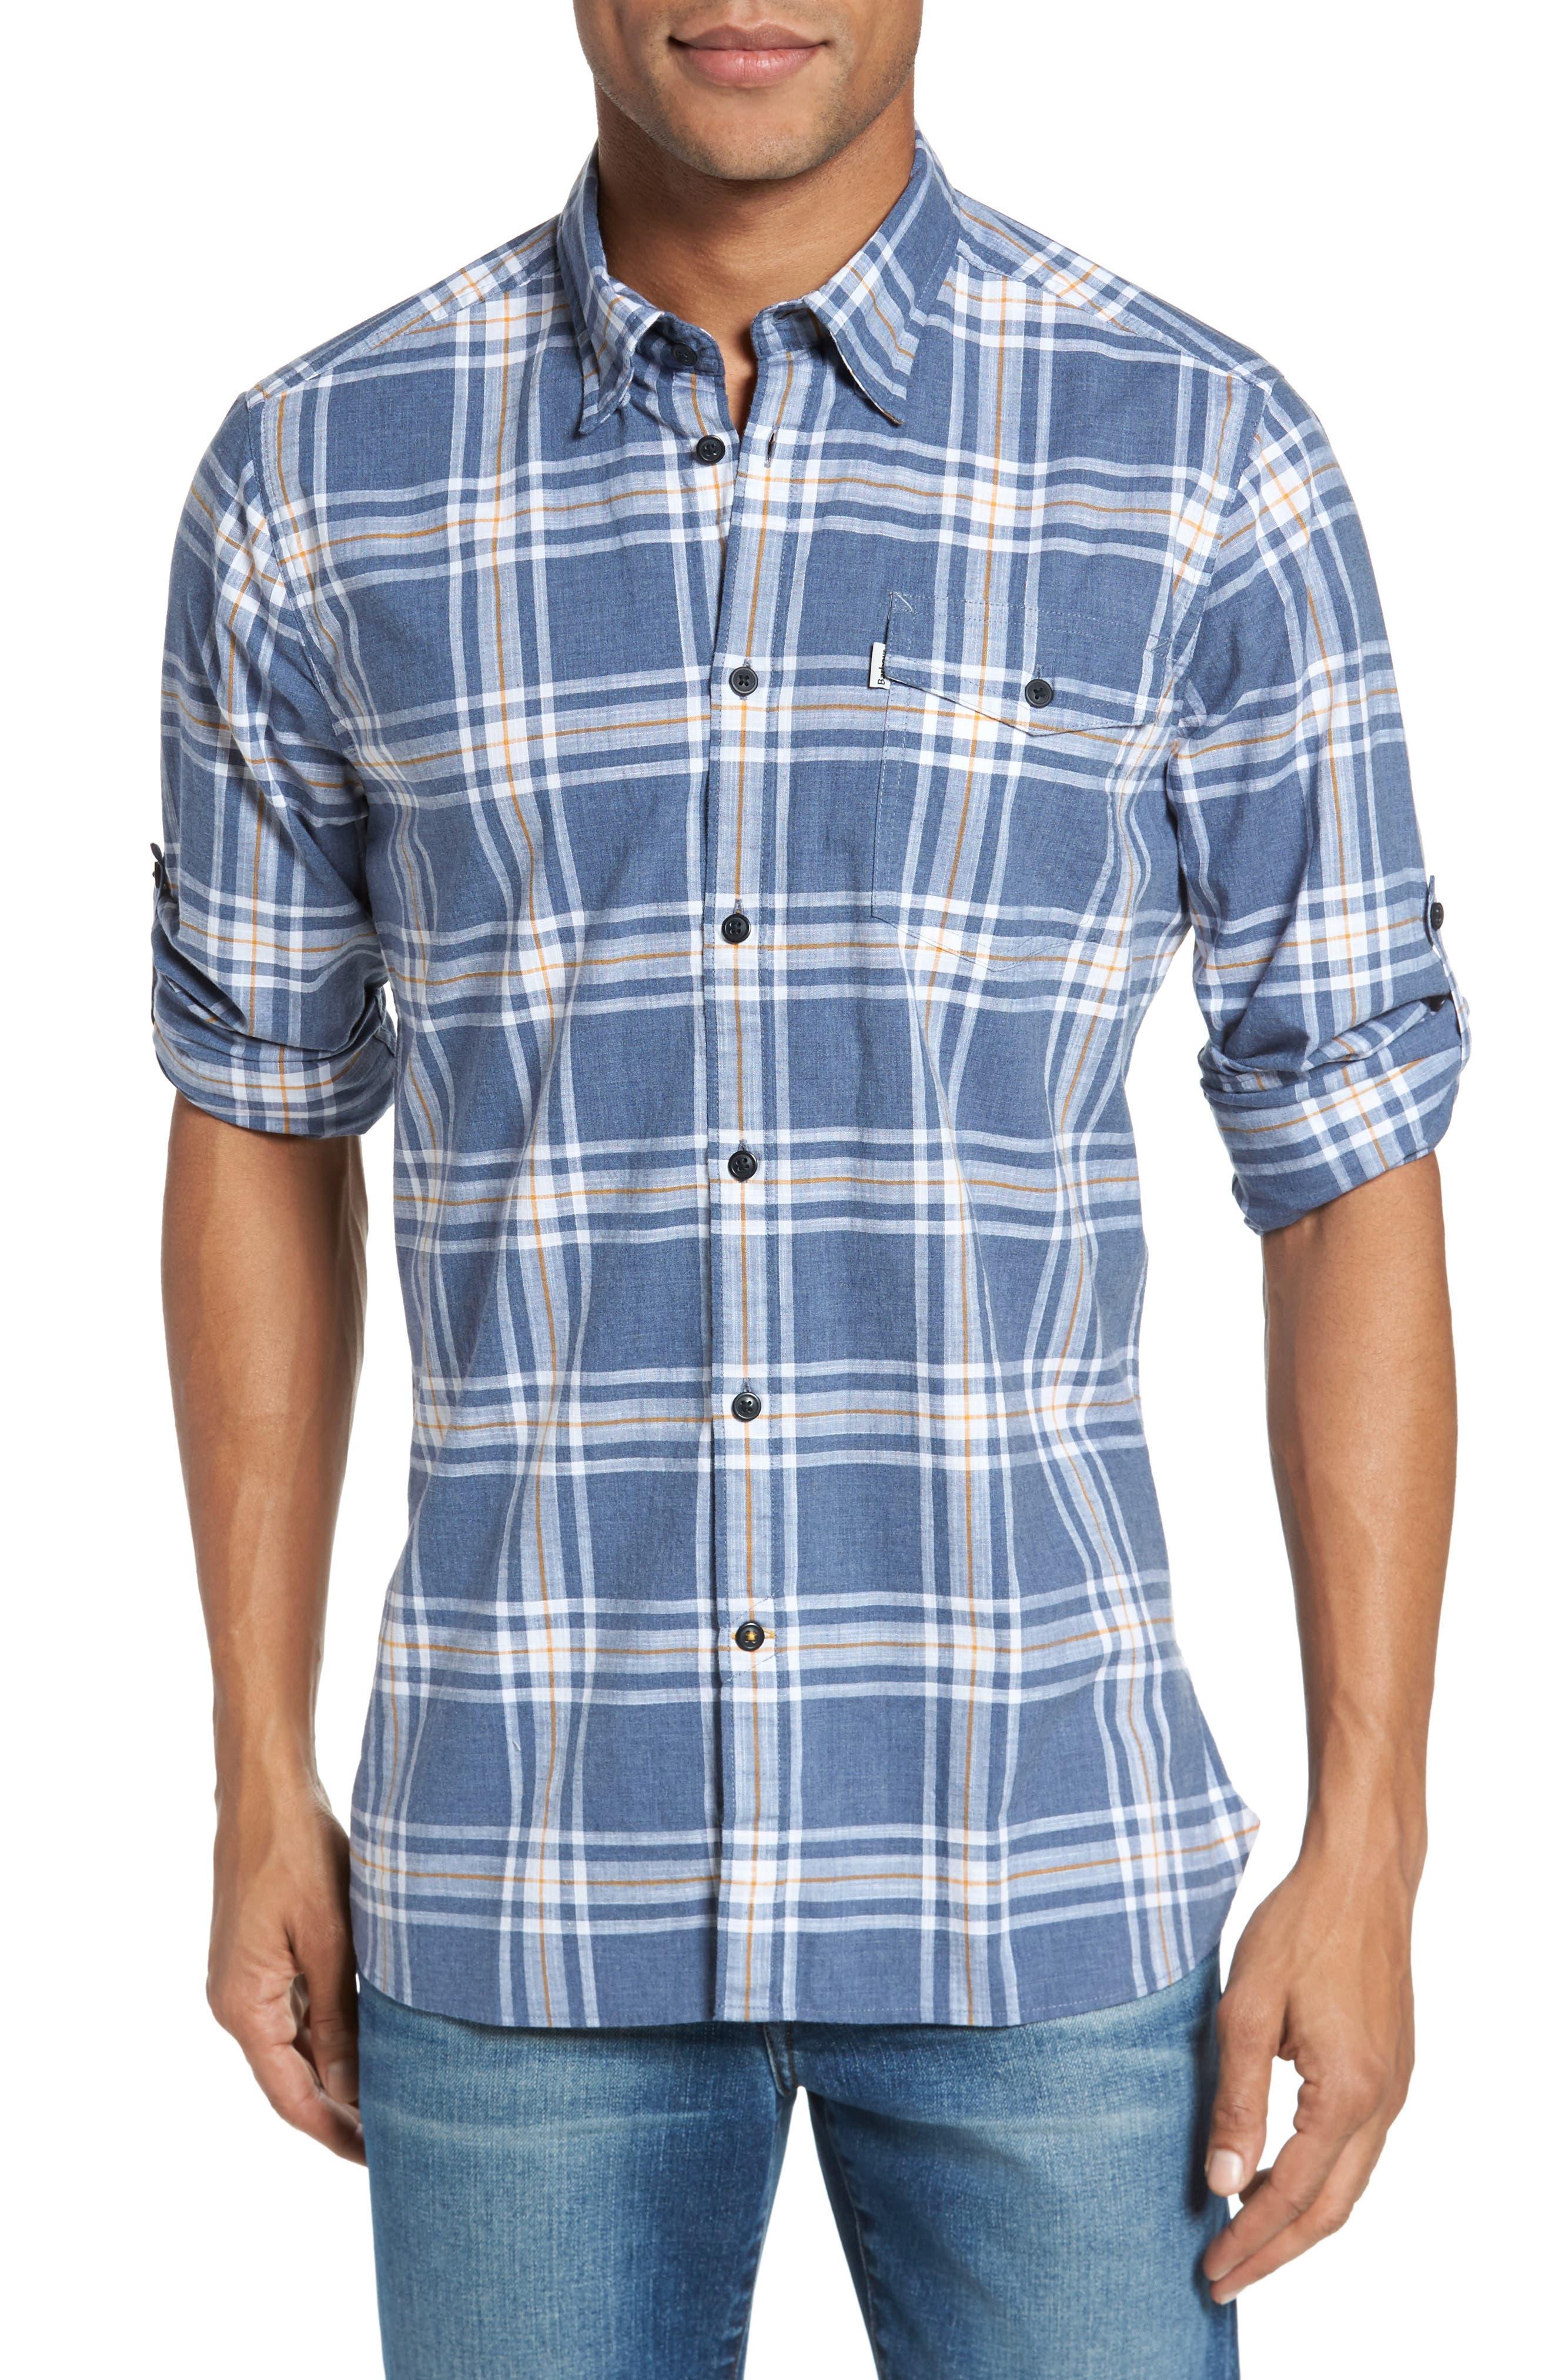 Elver Tailored Fit Plaid Sport Shirt,                             Main thumbnail 1, color,                             410